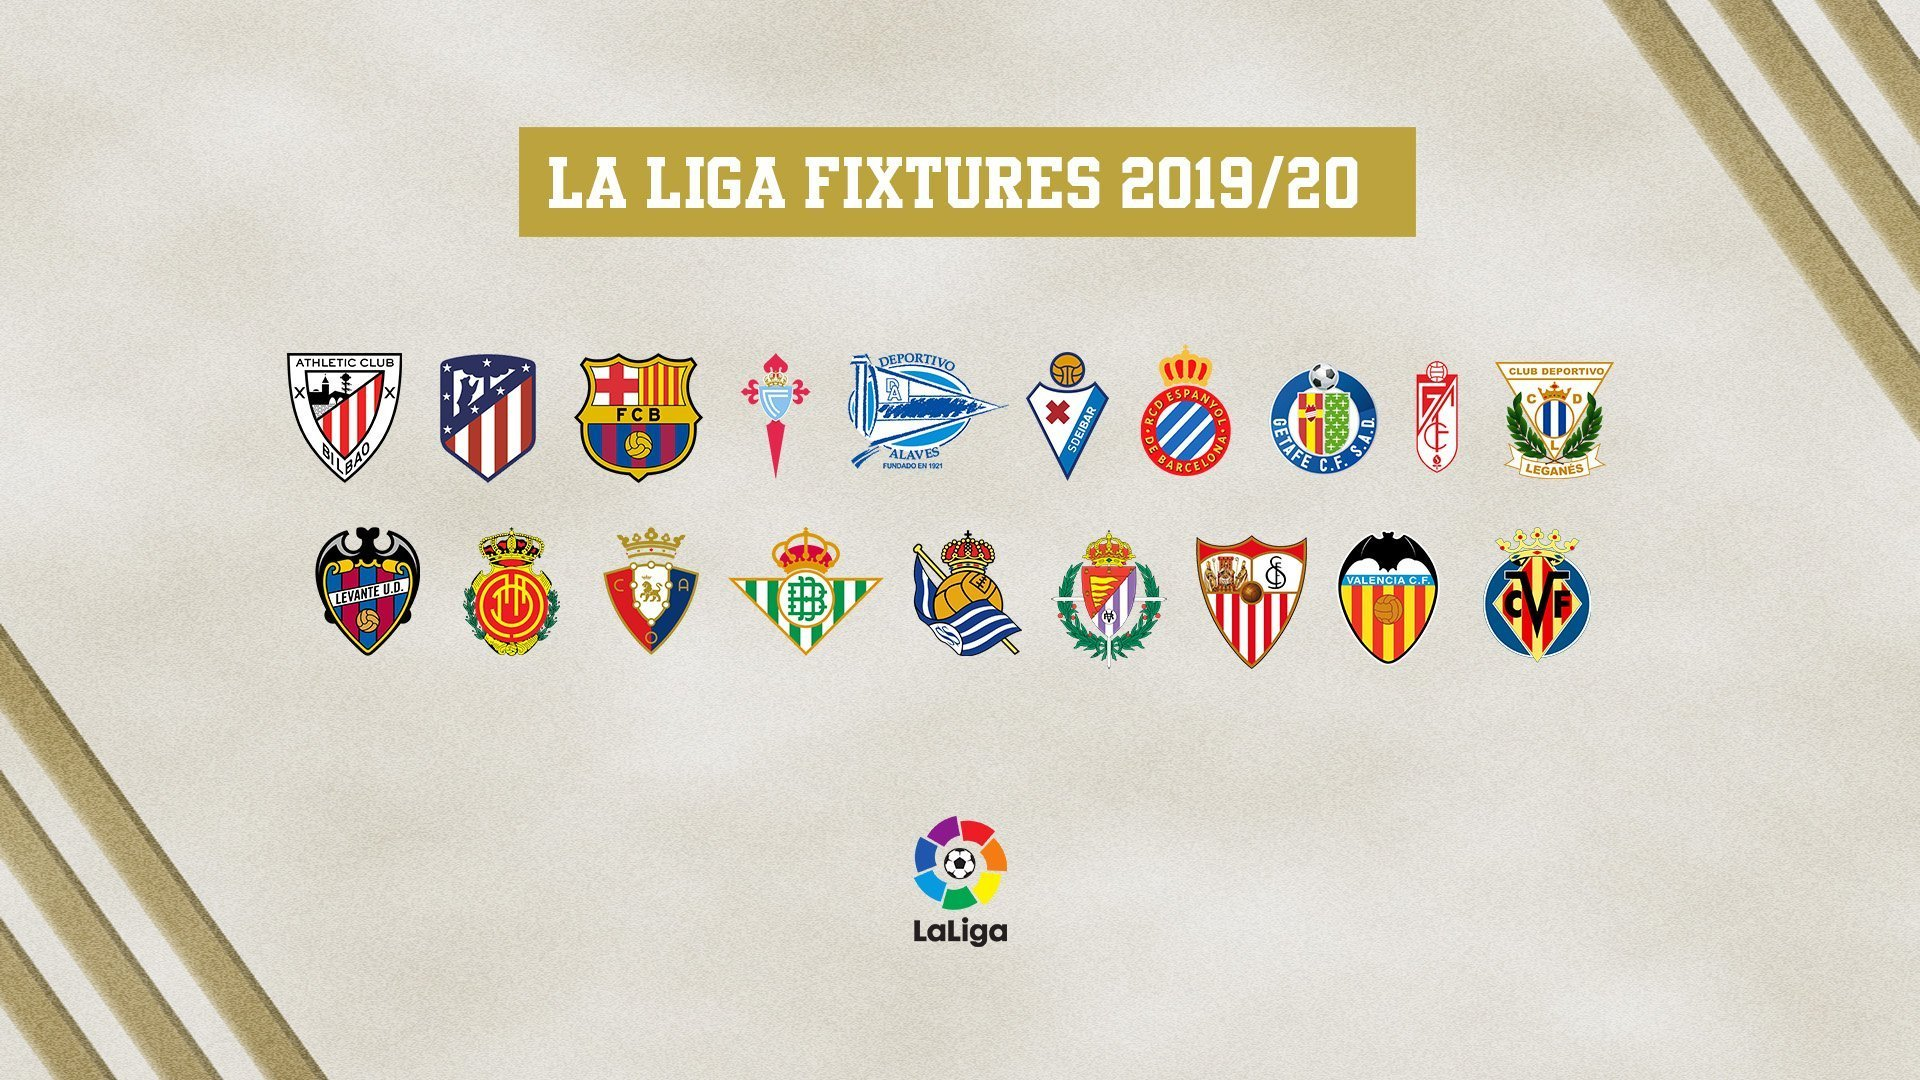 Revealed: Real Madrid's 2019/20 LaLiga fixtures